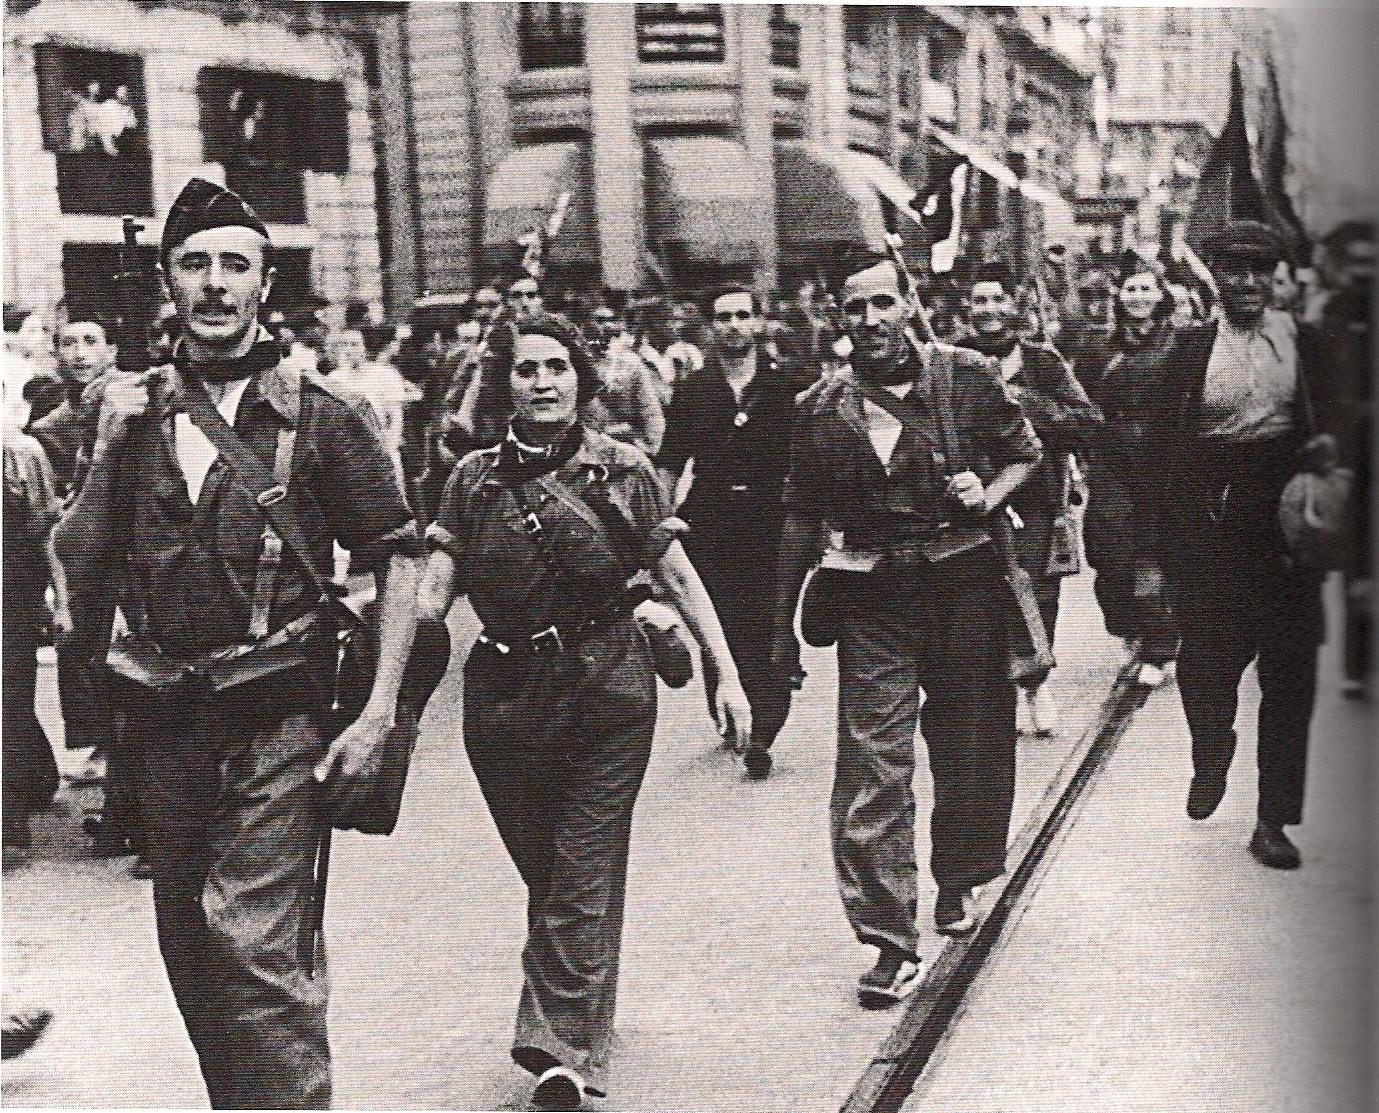 Risultati immagini per guerra spagnola antifascismo contropiano immagini